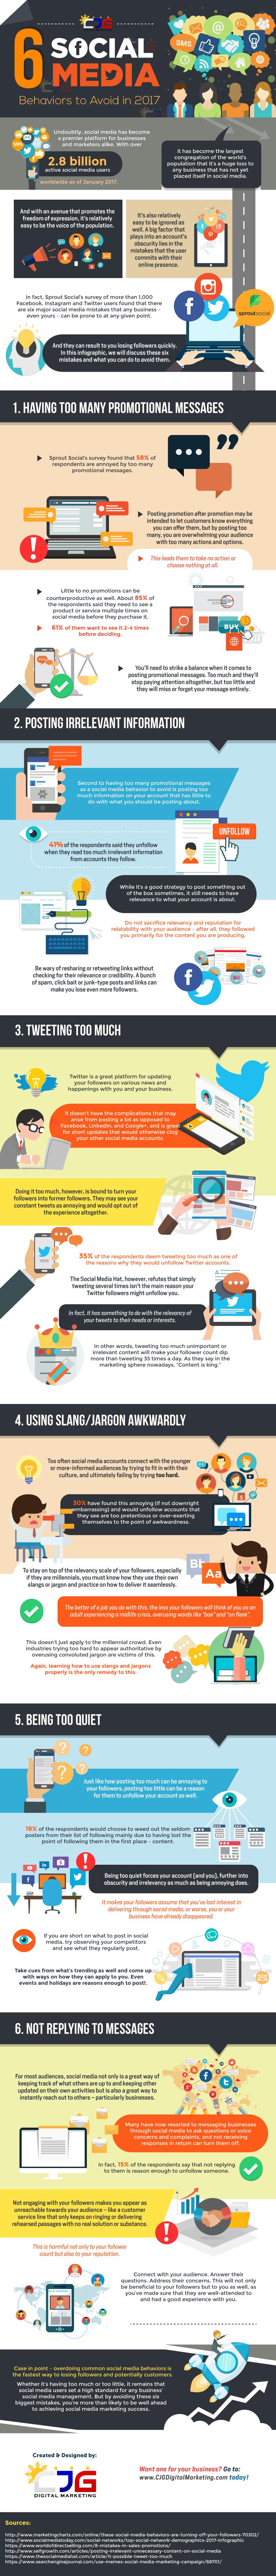 6 Social Media Behaviors to Avoid in 2017 [Infographic] | Social Media Today